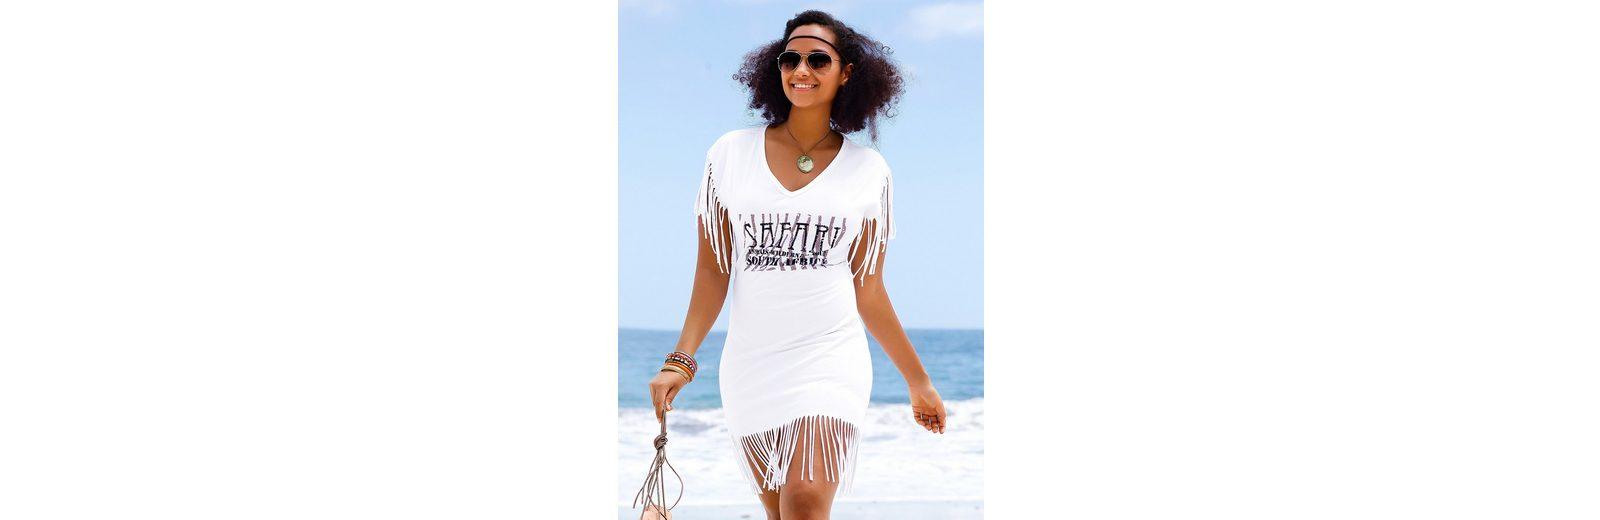 Beachtime mit Longshirt Beachtime mit Longshirt Beachtime Fransen Longshirt mit Fransen p8qdR8